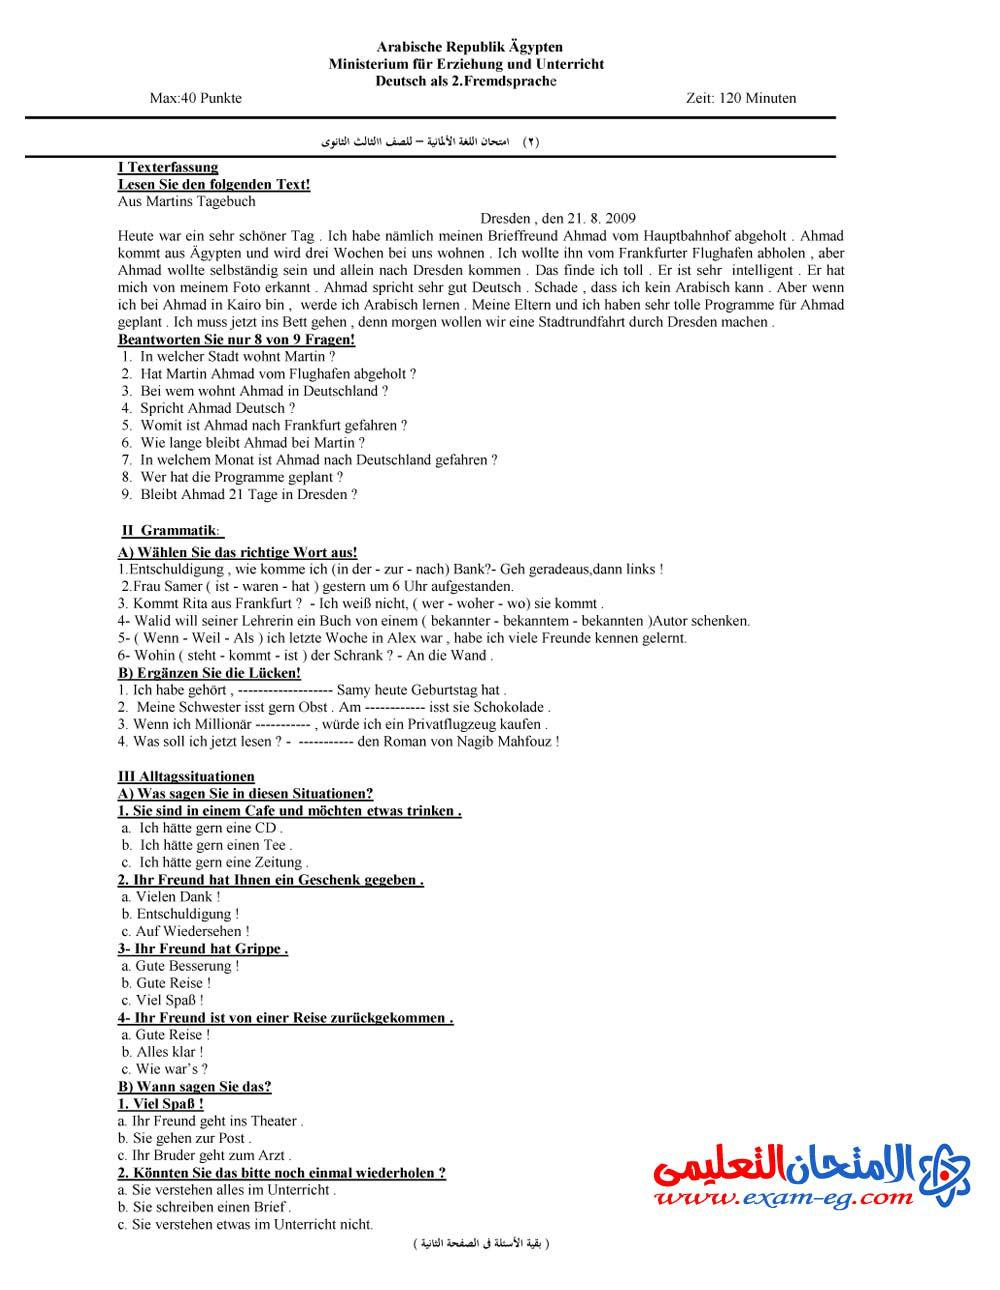 exam-eg.com_1396621281733.jpg